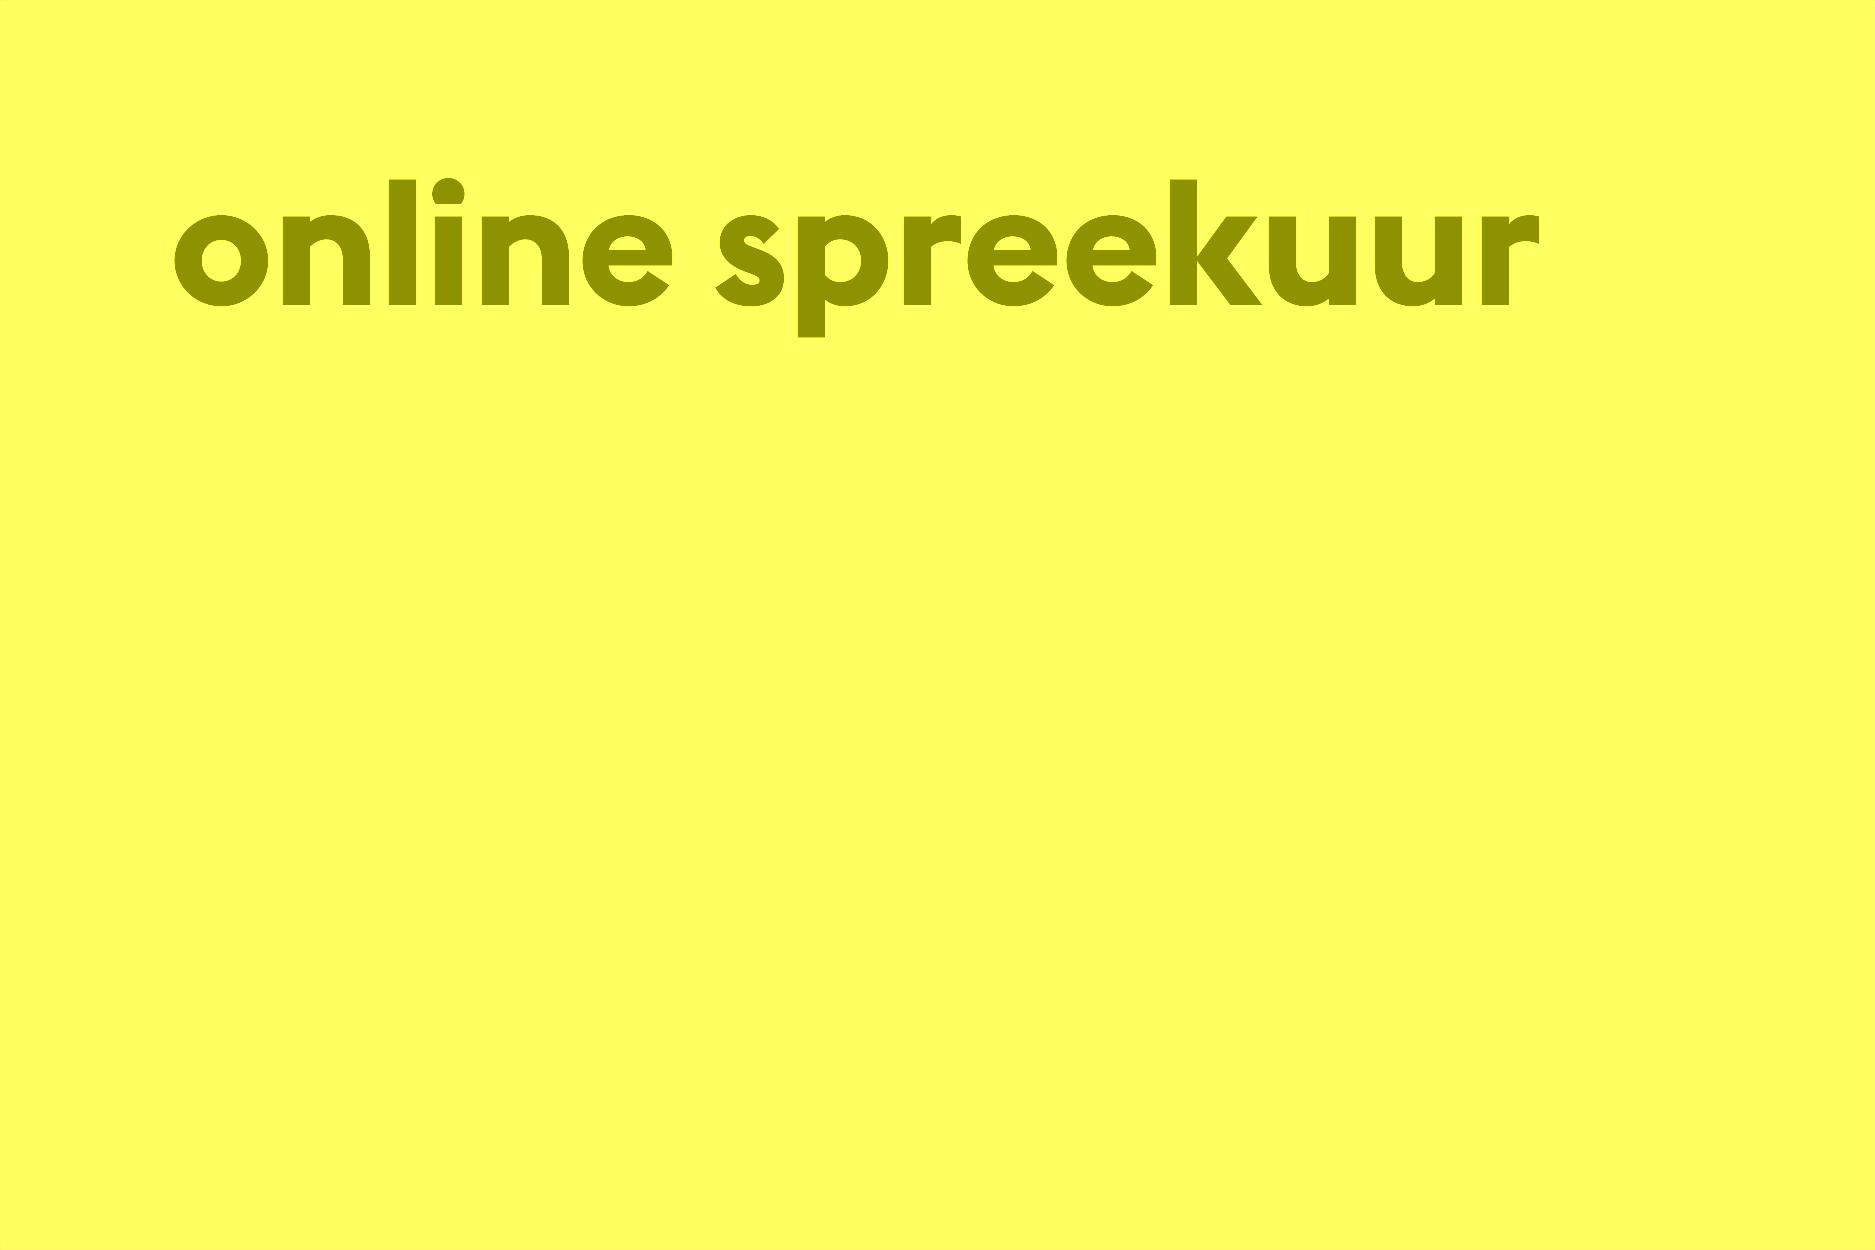 onlinespreekuurweb.jpg